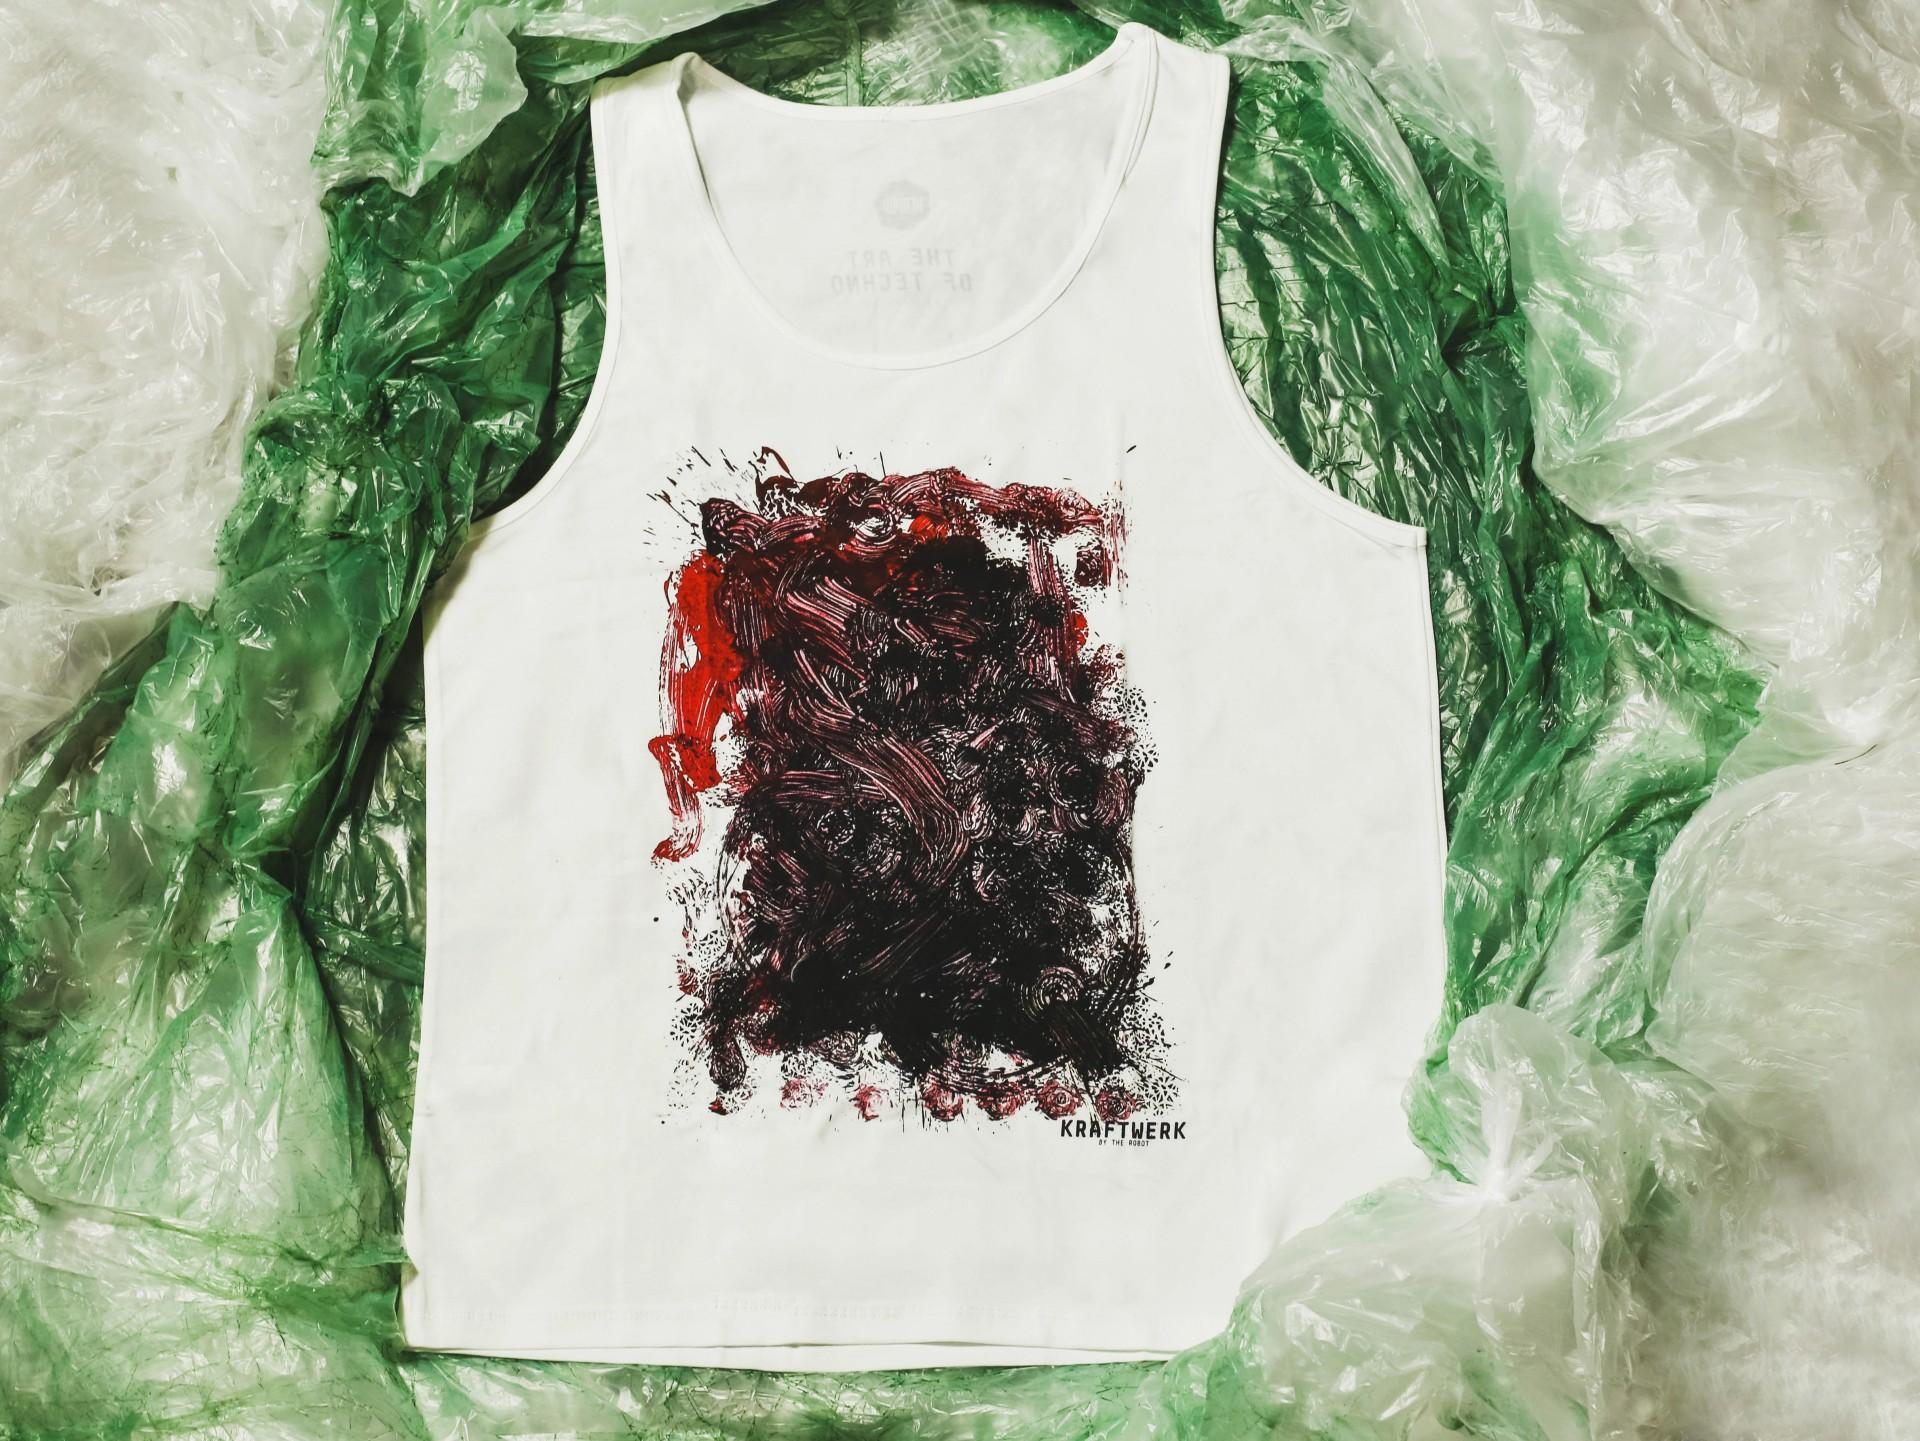 White Singlet Shirt (Kraftwerk)